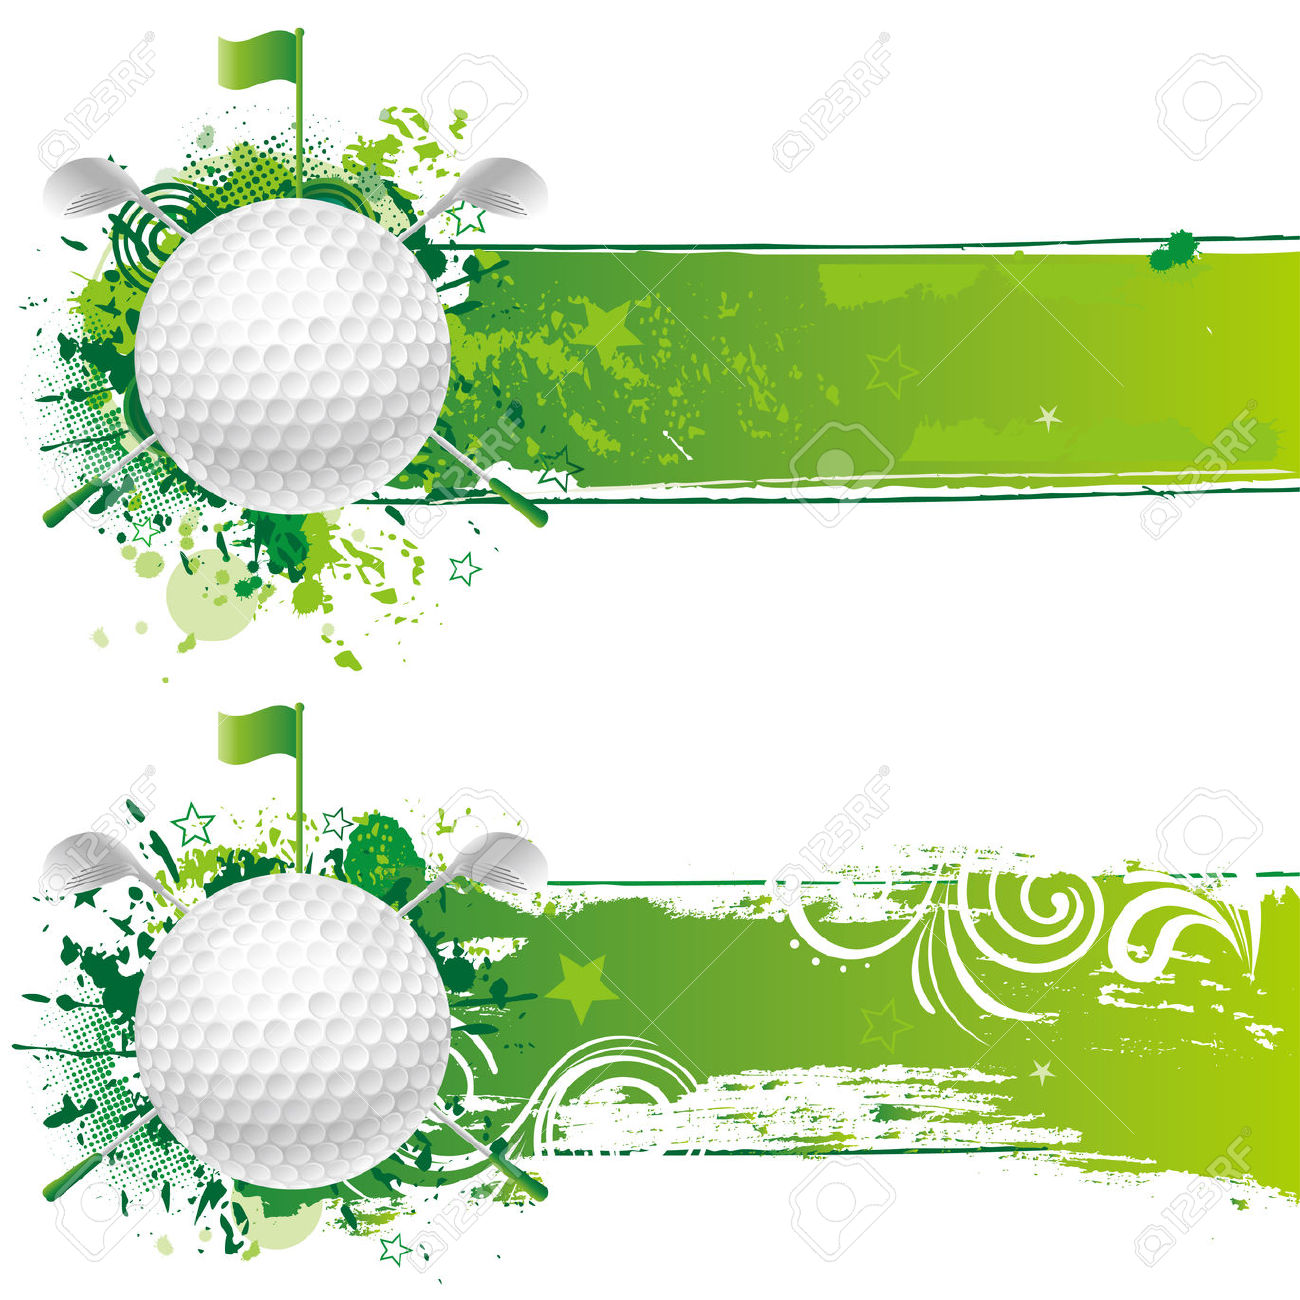 Golf Course clipart border Blank Clip clipart Art Borders